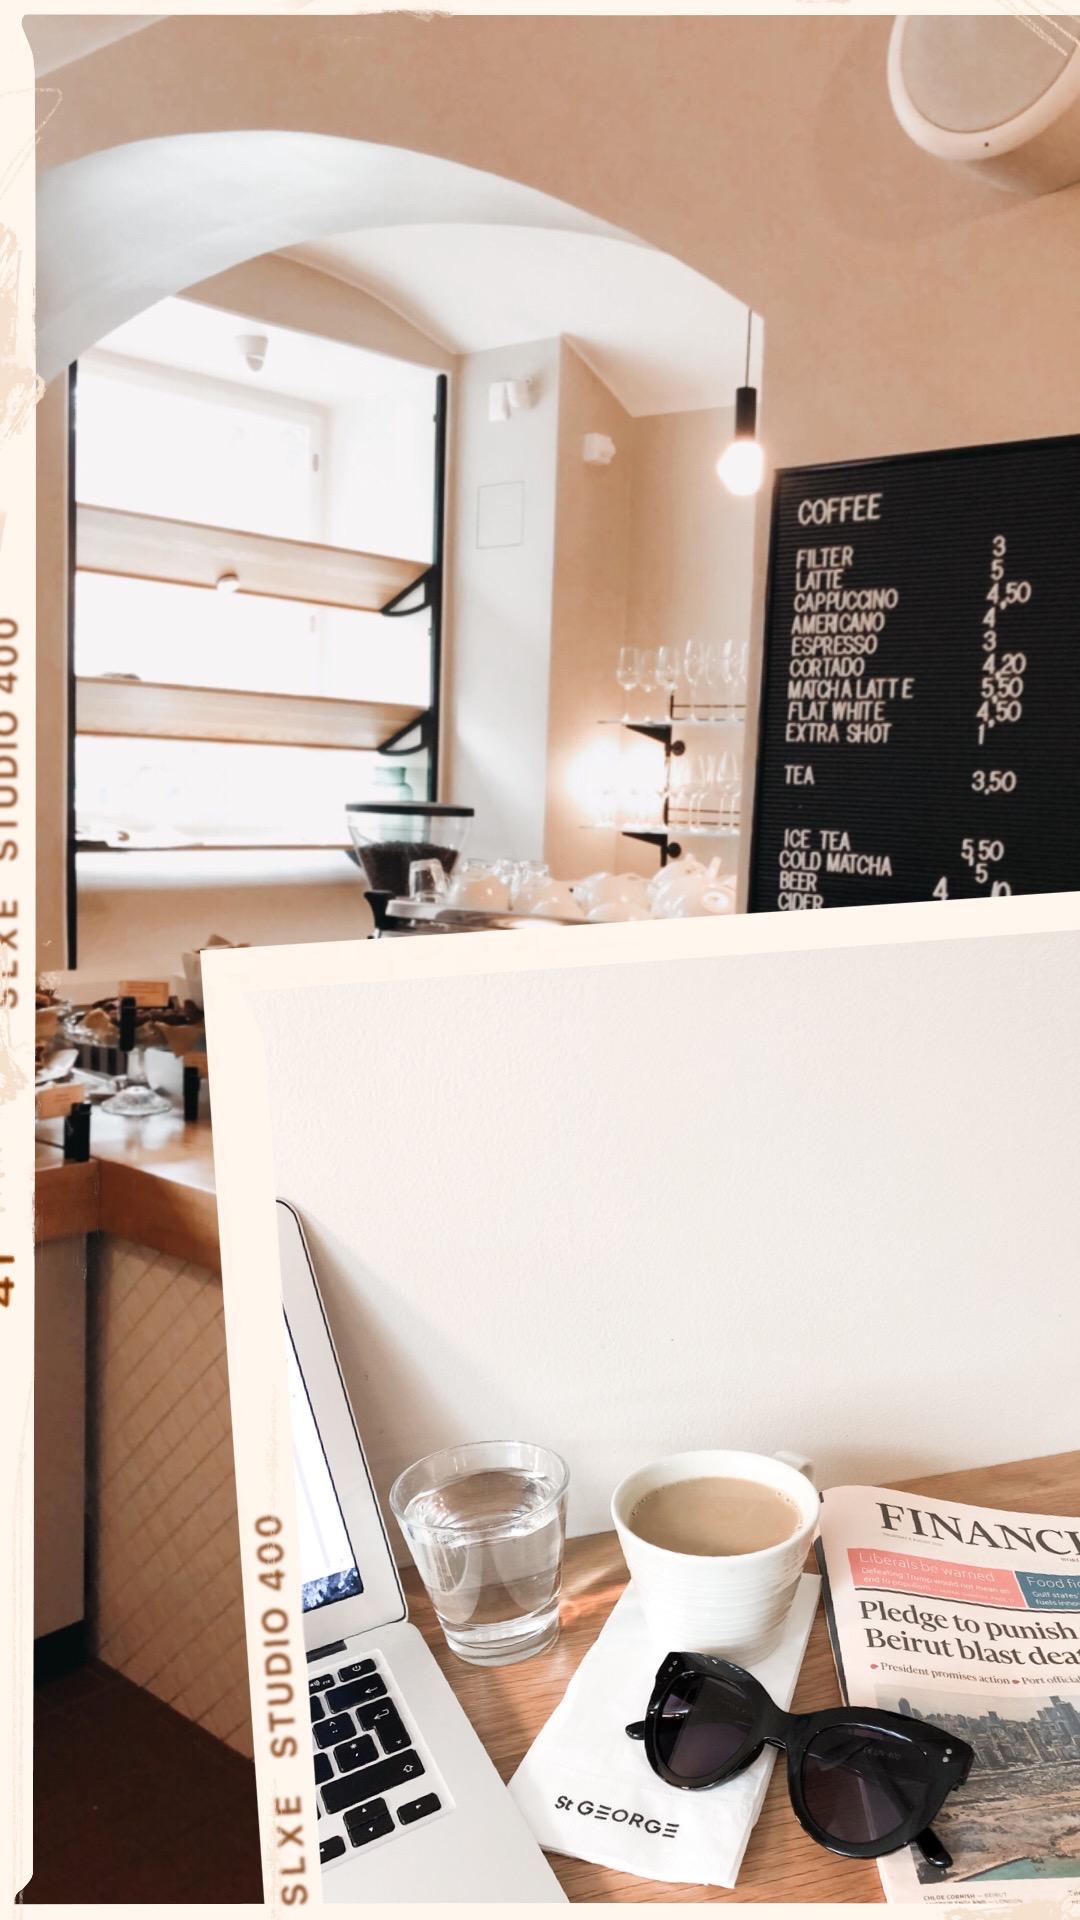 St. George Bakery, Helsinki, breakfast, lunch, dinner - Helsingin parhaat kahvilat ja ravintolat